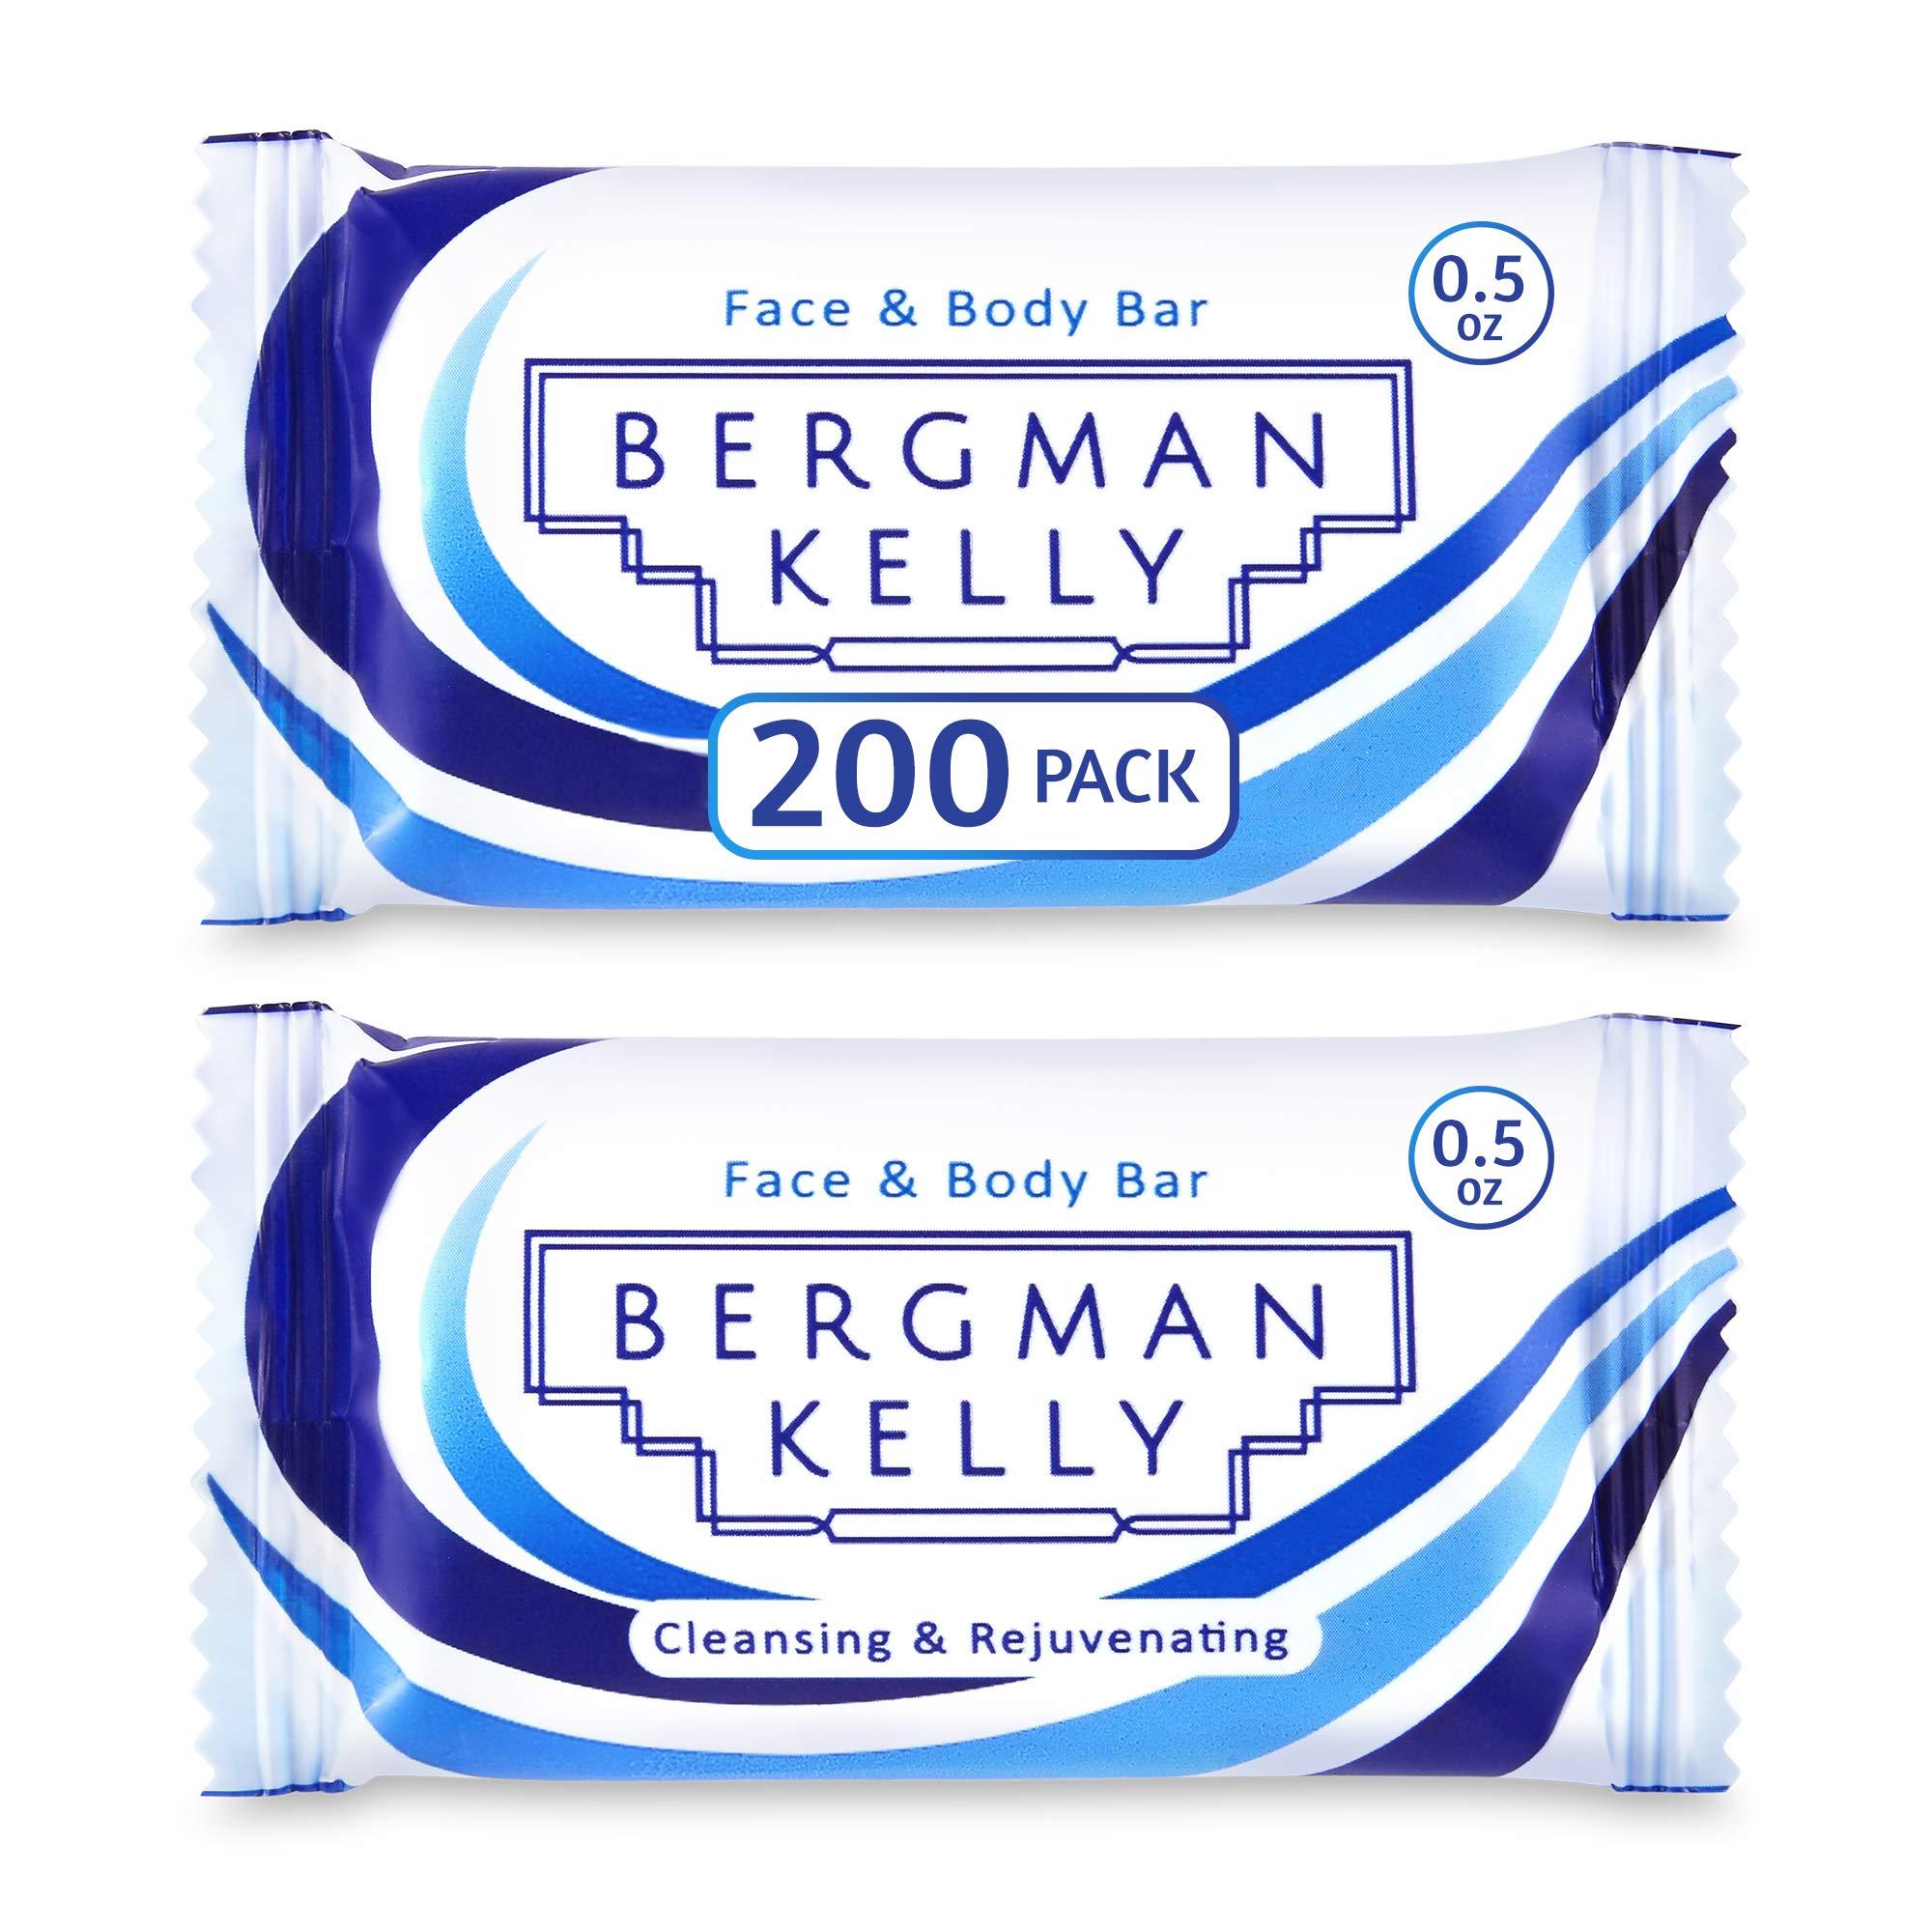 BERGMAN KELLY Sanitary Soap Bars (0.5 Oz, 200 PK, White Tea), Travel Size Luxury Bulk Hotel Bar Soap, Mini Individually Wrapped Rectangular Soap, Hotel Toiletries for AirBnB, Motel, Guest Bathroom